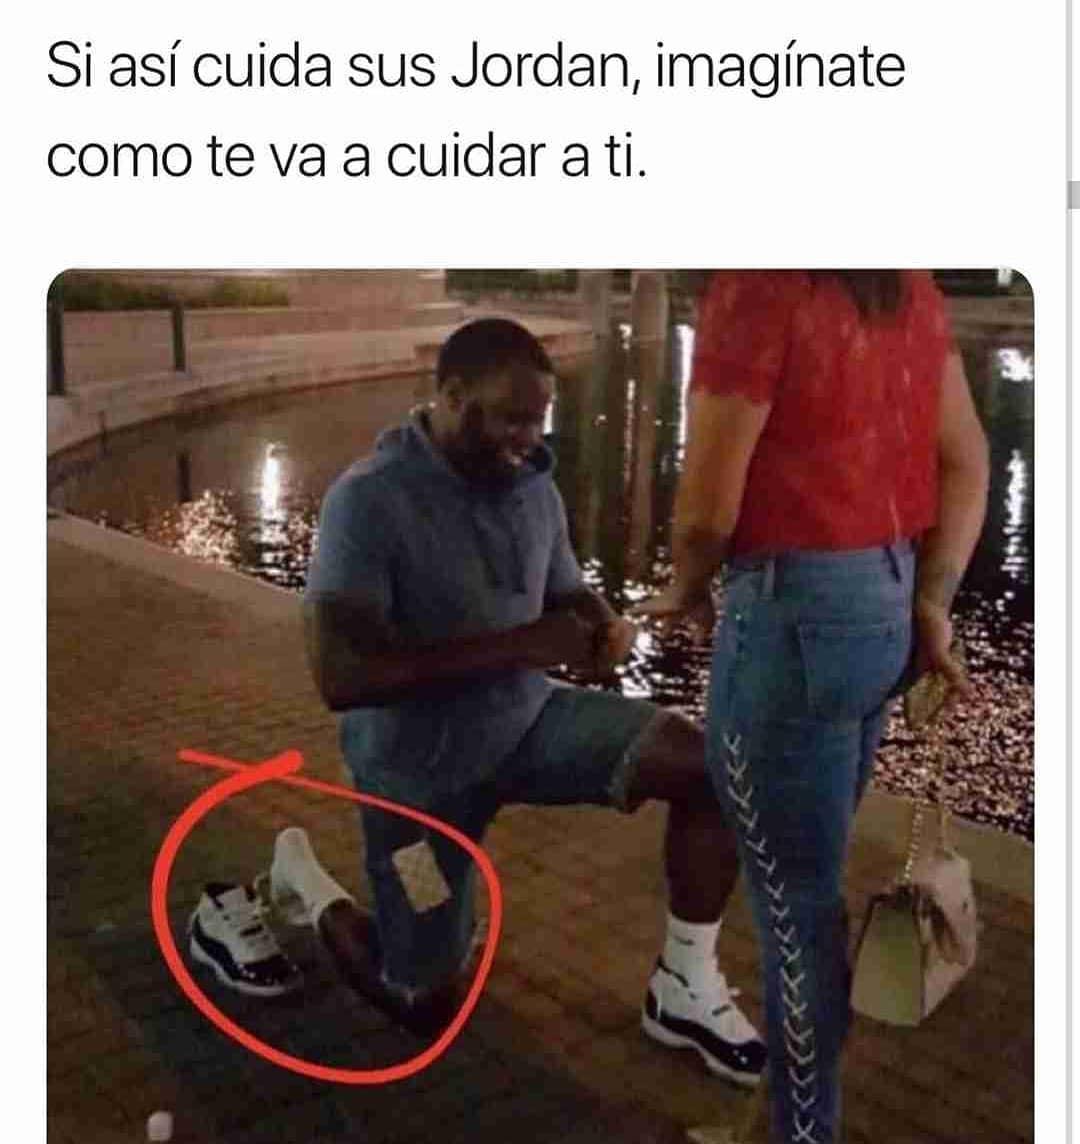 Si así cuida sus Jordan, imagínate como te va a cuidar a ti.